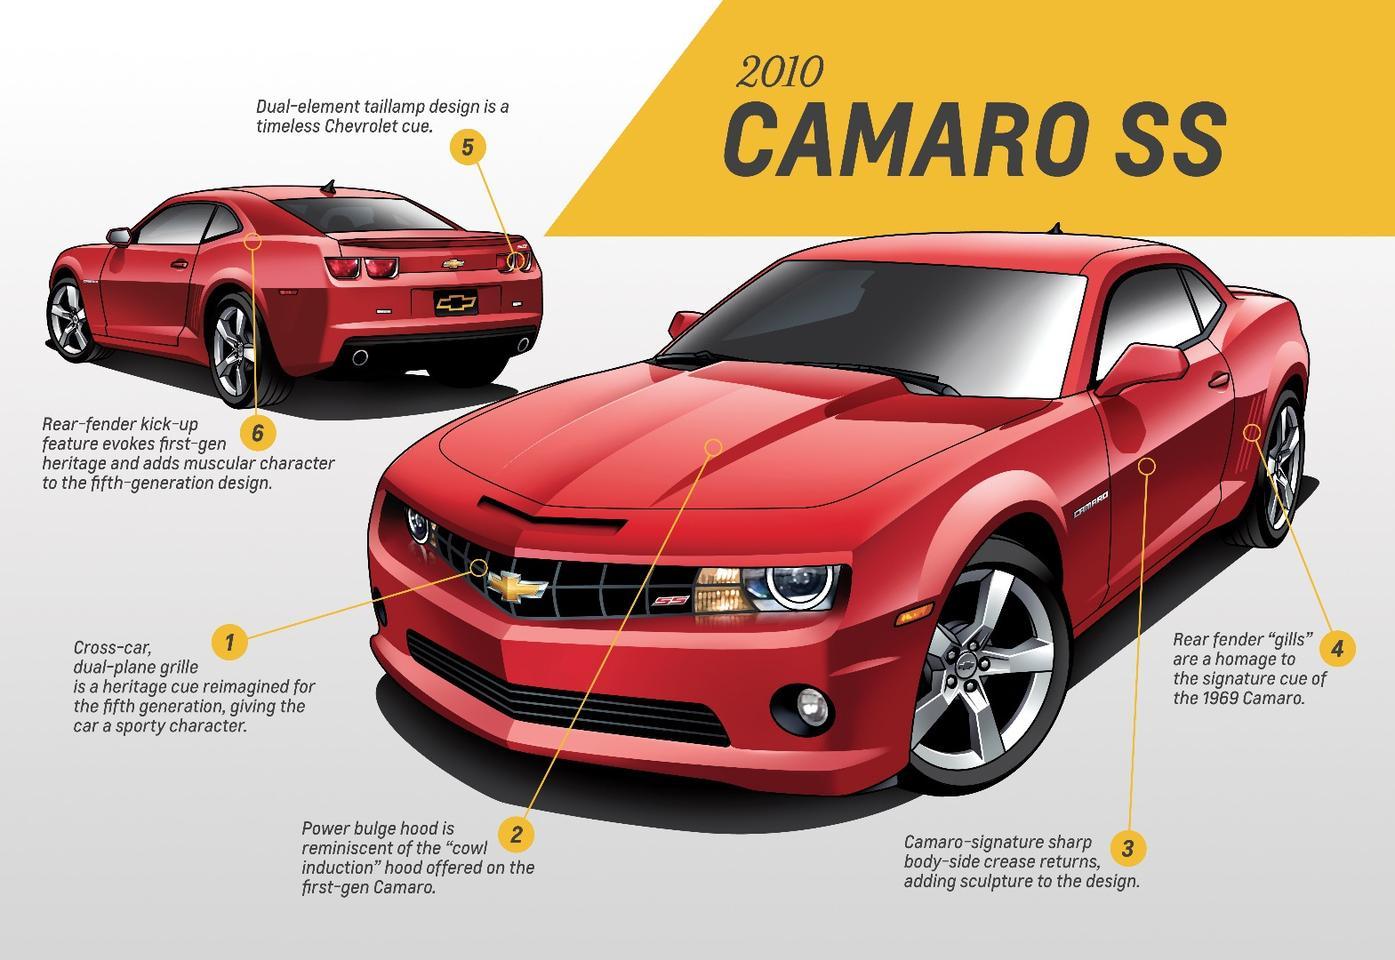 The fifth-generation Camaro